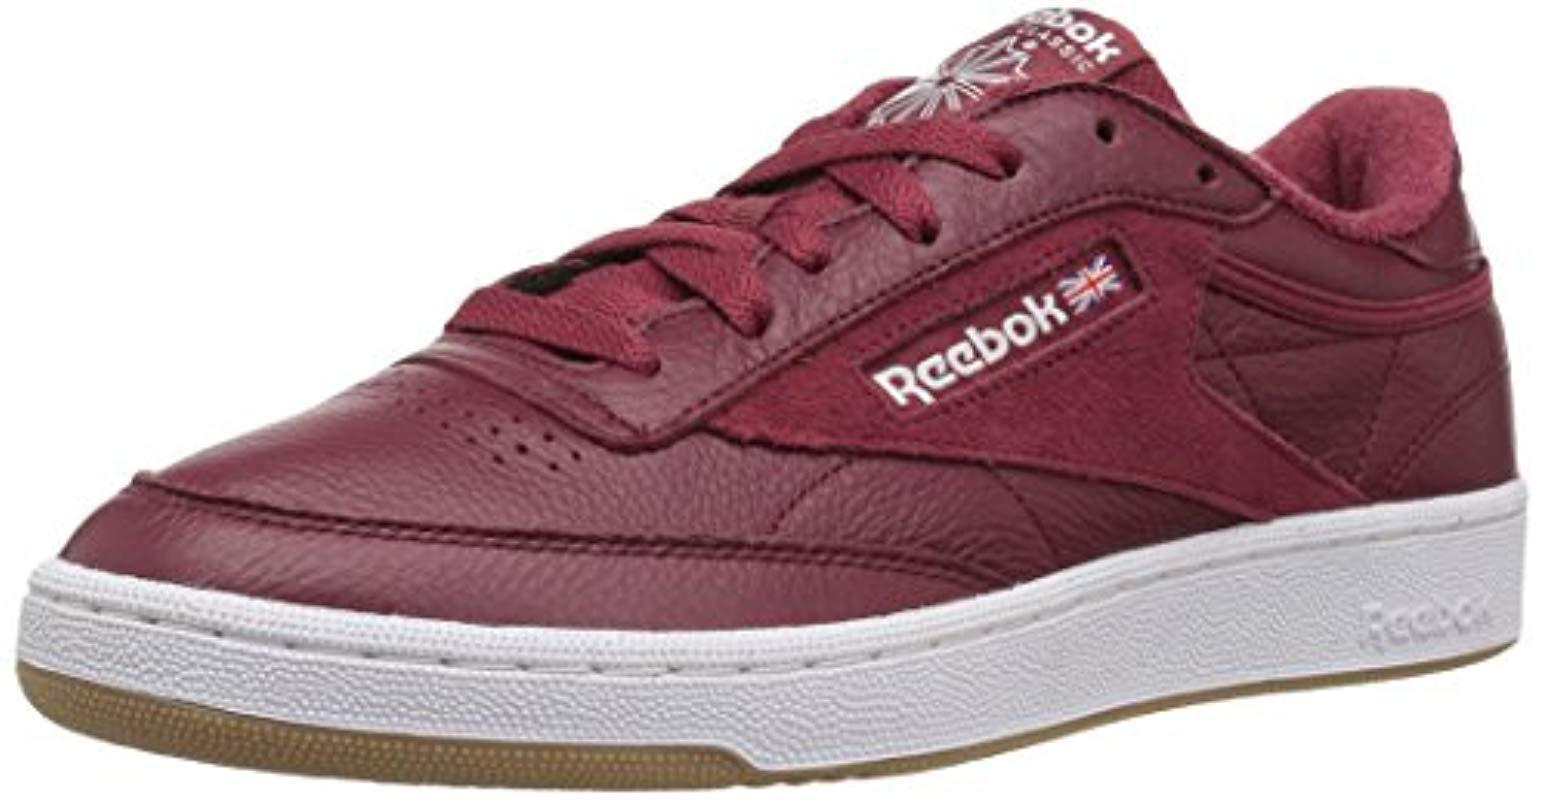 0d984b633 Lyst - Reebok Club C 85 Estl Sneaker for Men